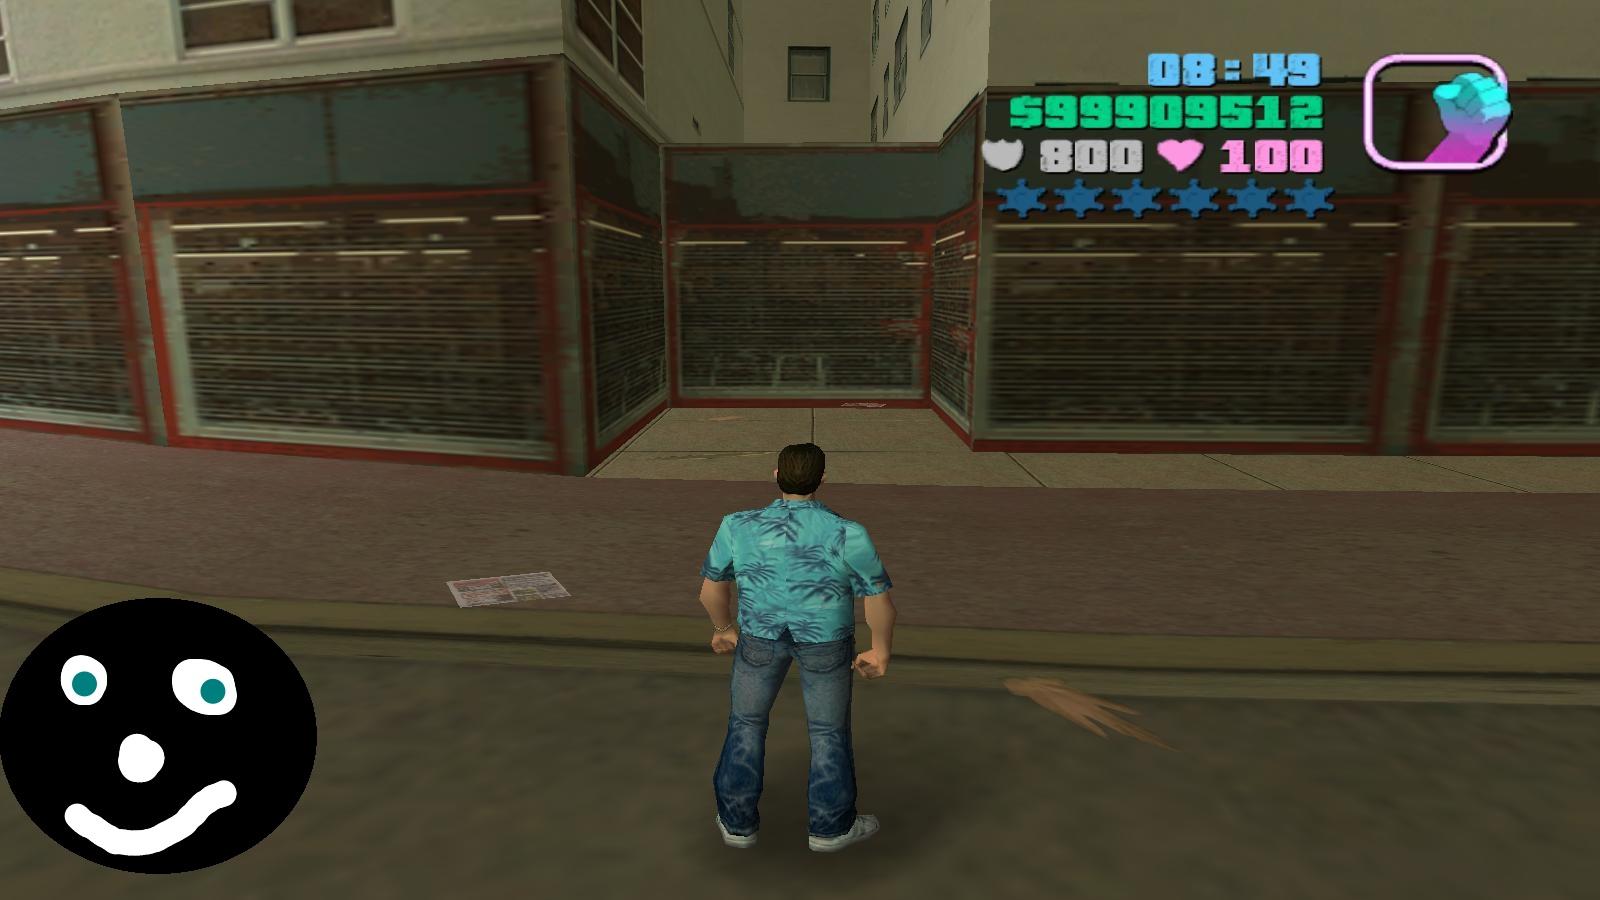 10 - Grand Theft Auto: Vice City